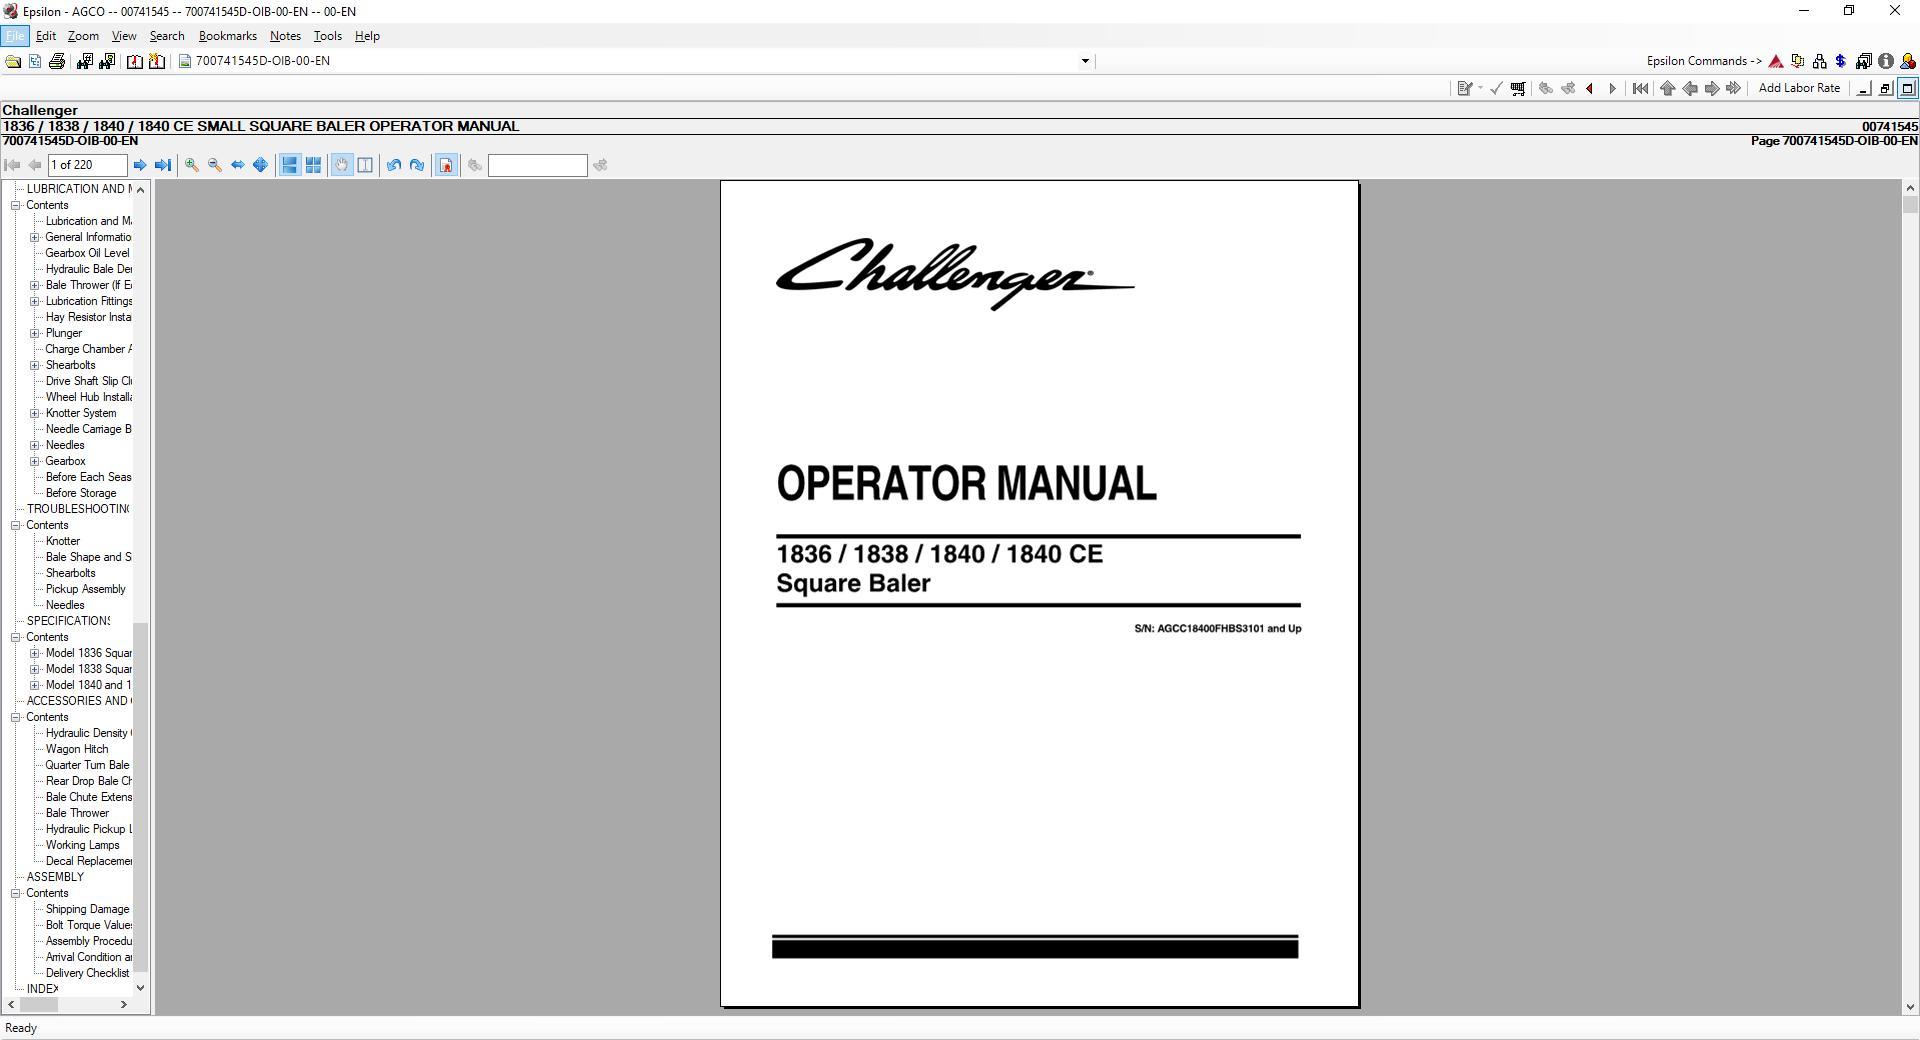 Challenger_AG_Europe_Parts_Catalog_Workshop_Service_Manuals_05201911